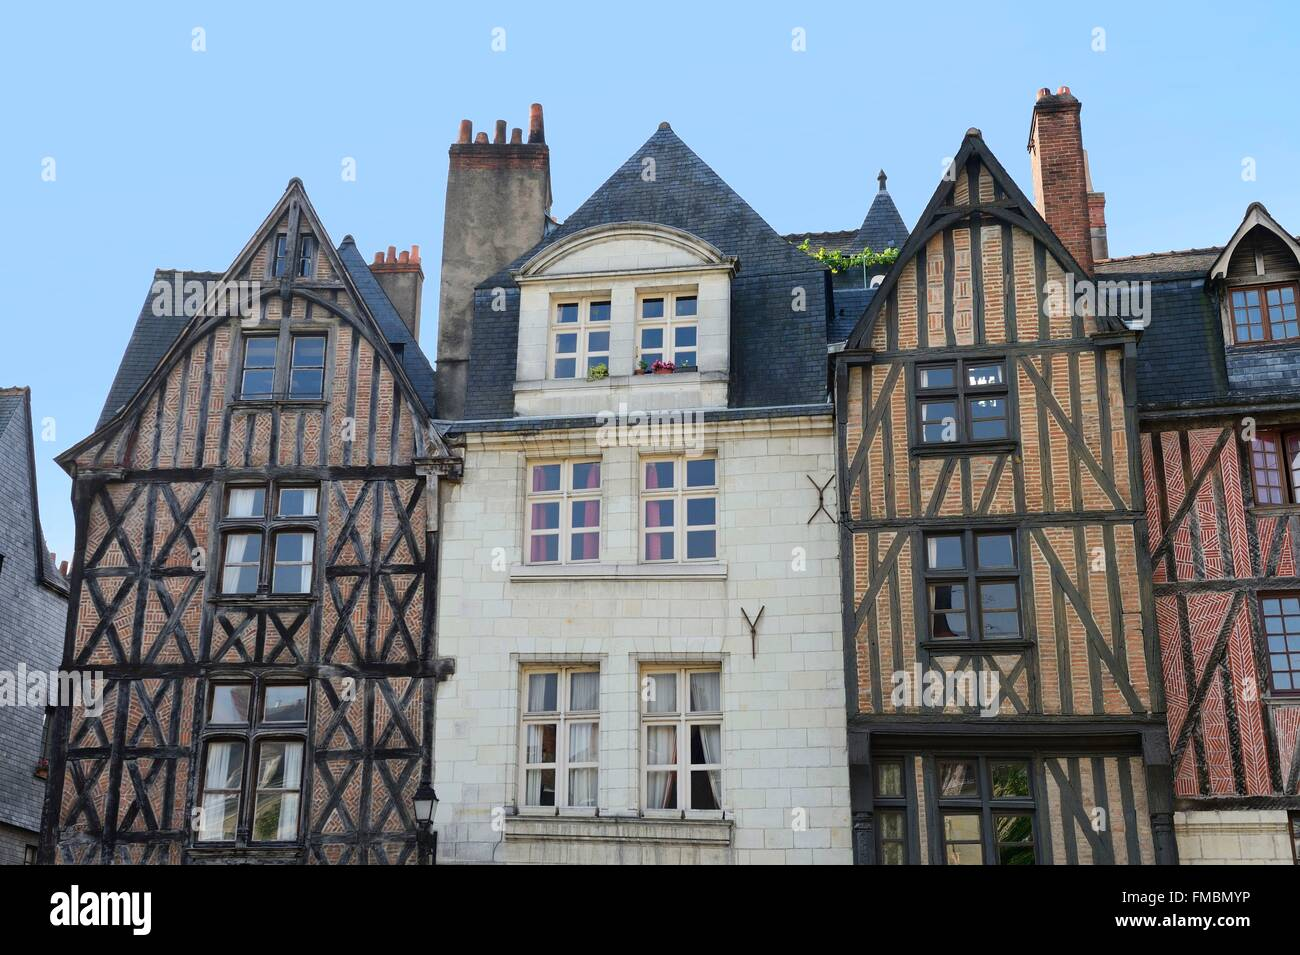 France, Indre et Loire, Tours, the old area, Plumereau square - Stock Image